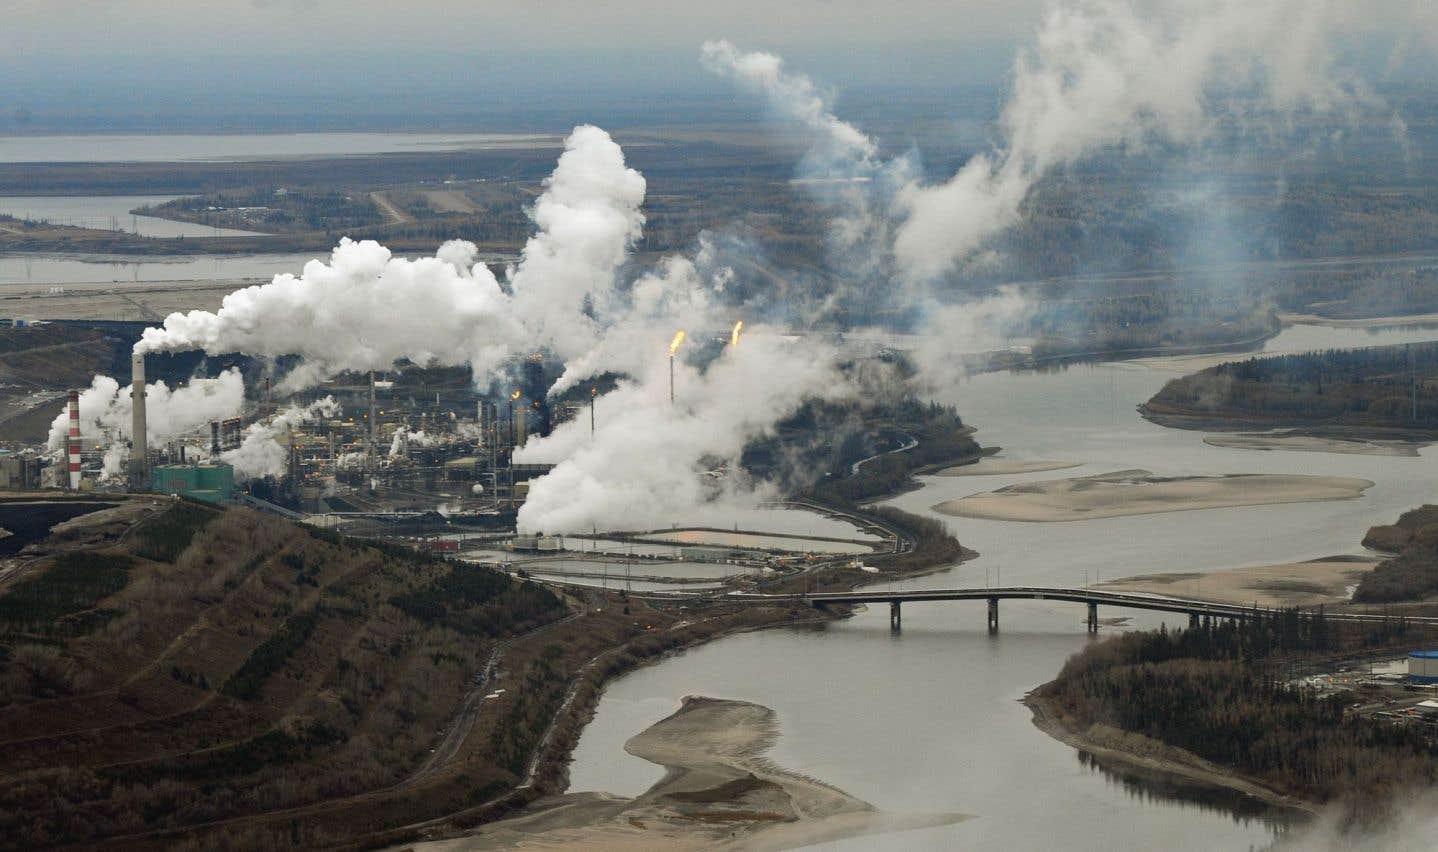 Changement de climat à Ottawa